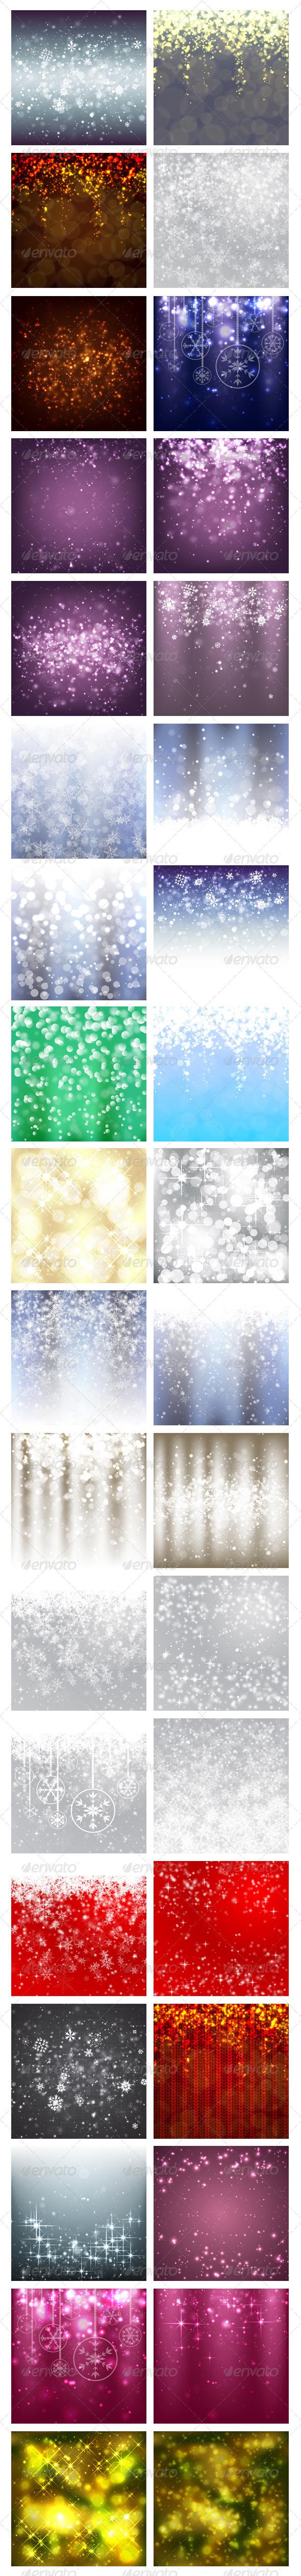 36 Merry Christmas Vector Backgrounds - Christmas Seasons/Holidays